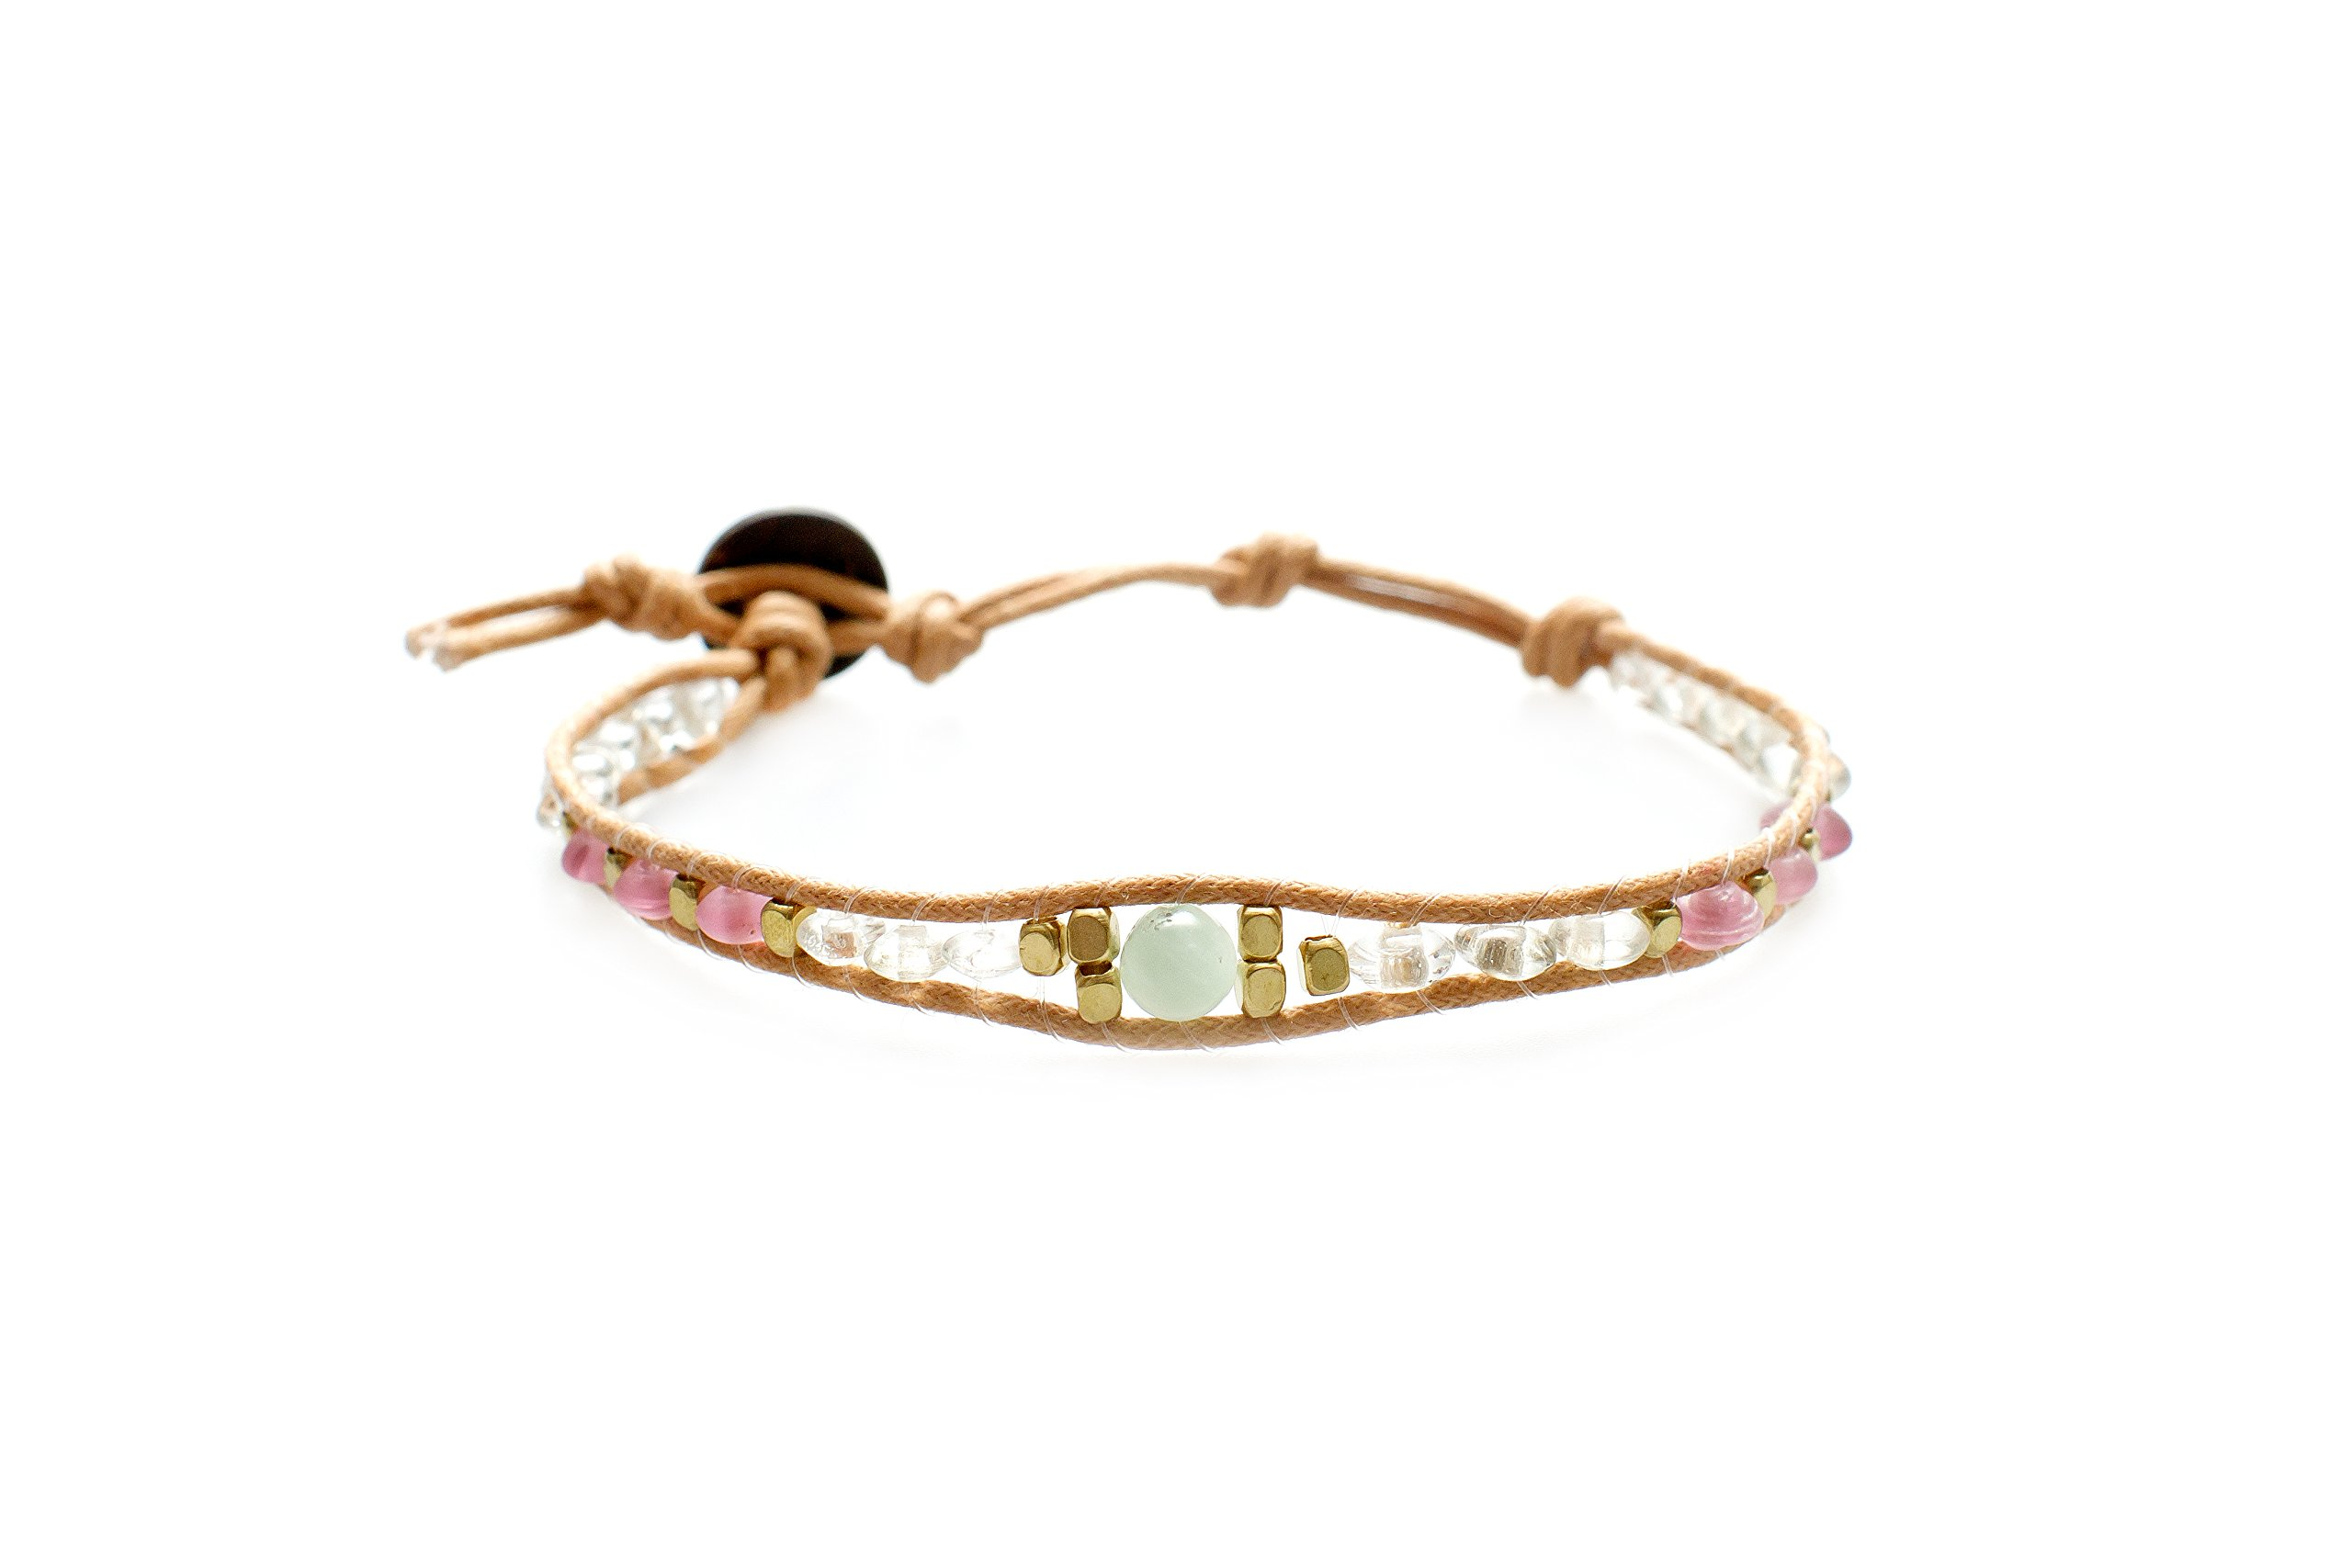 Lotus and Luna Rose and Salt Water Boho Single Strand Bracelet with Seaglass